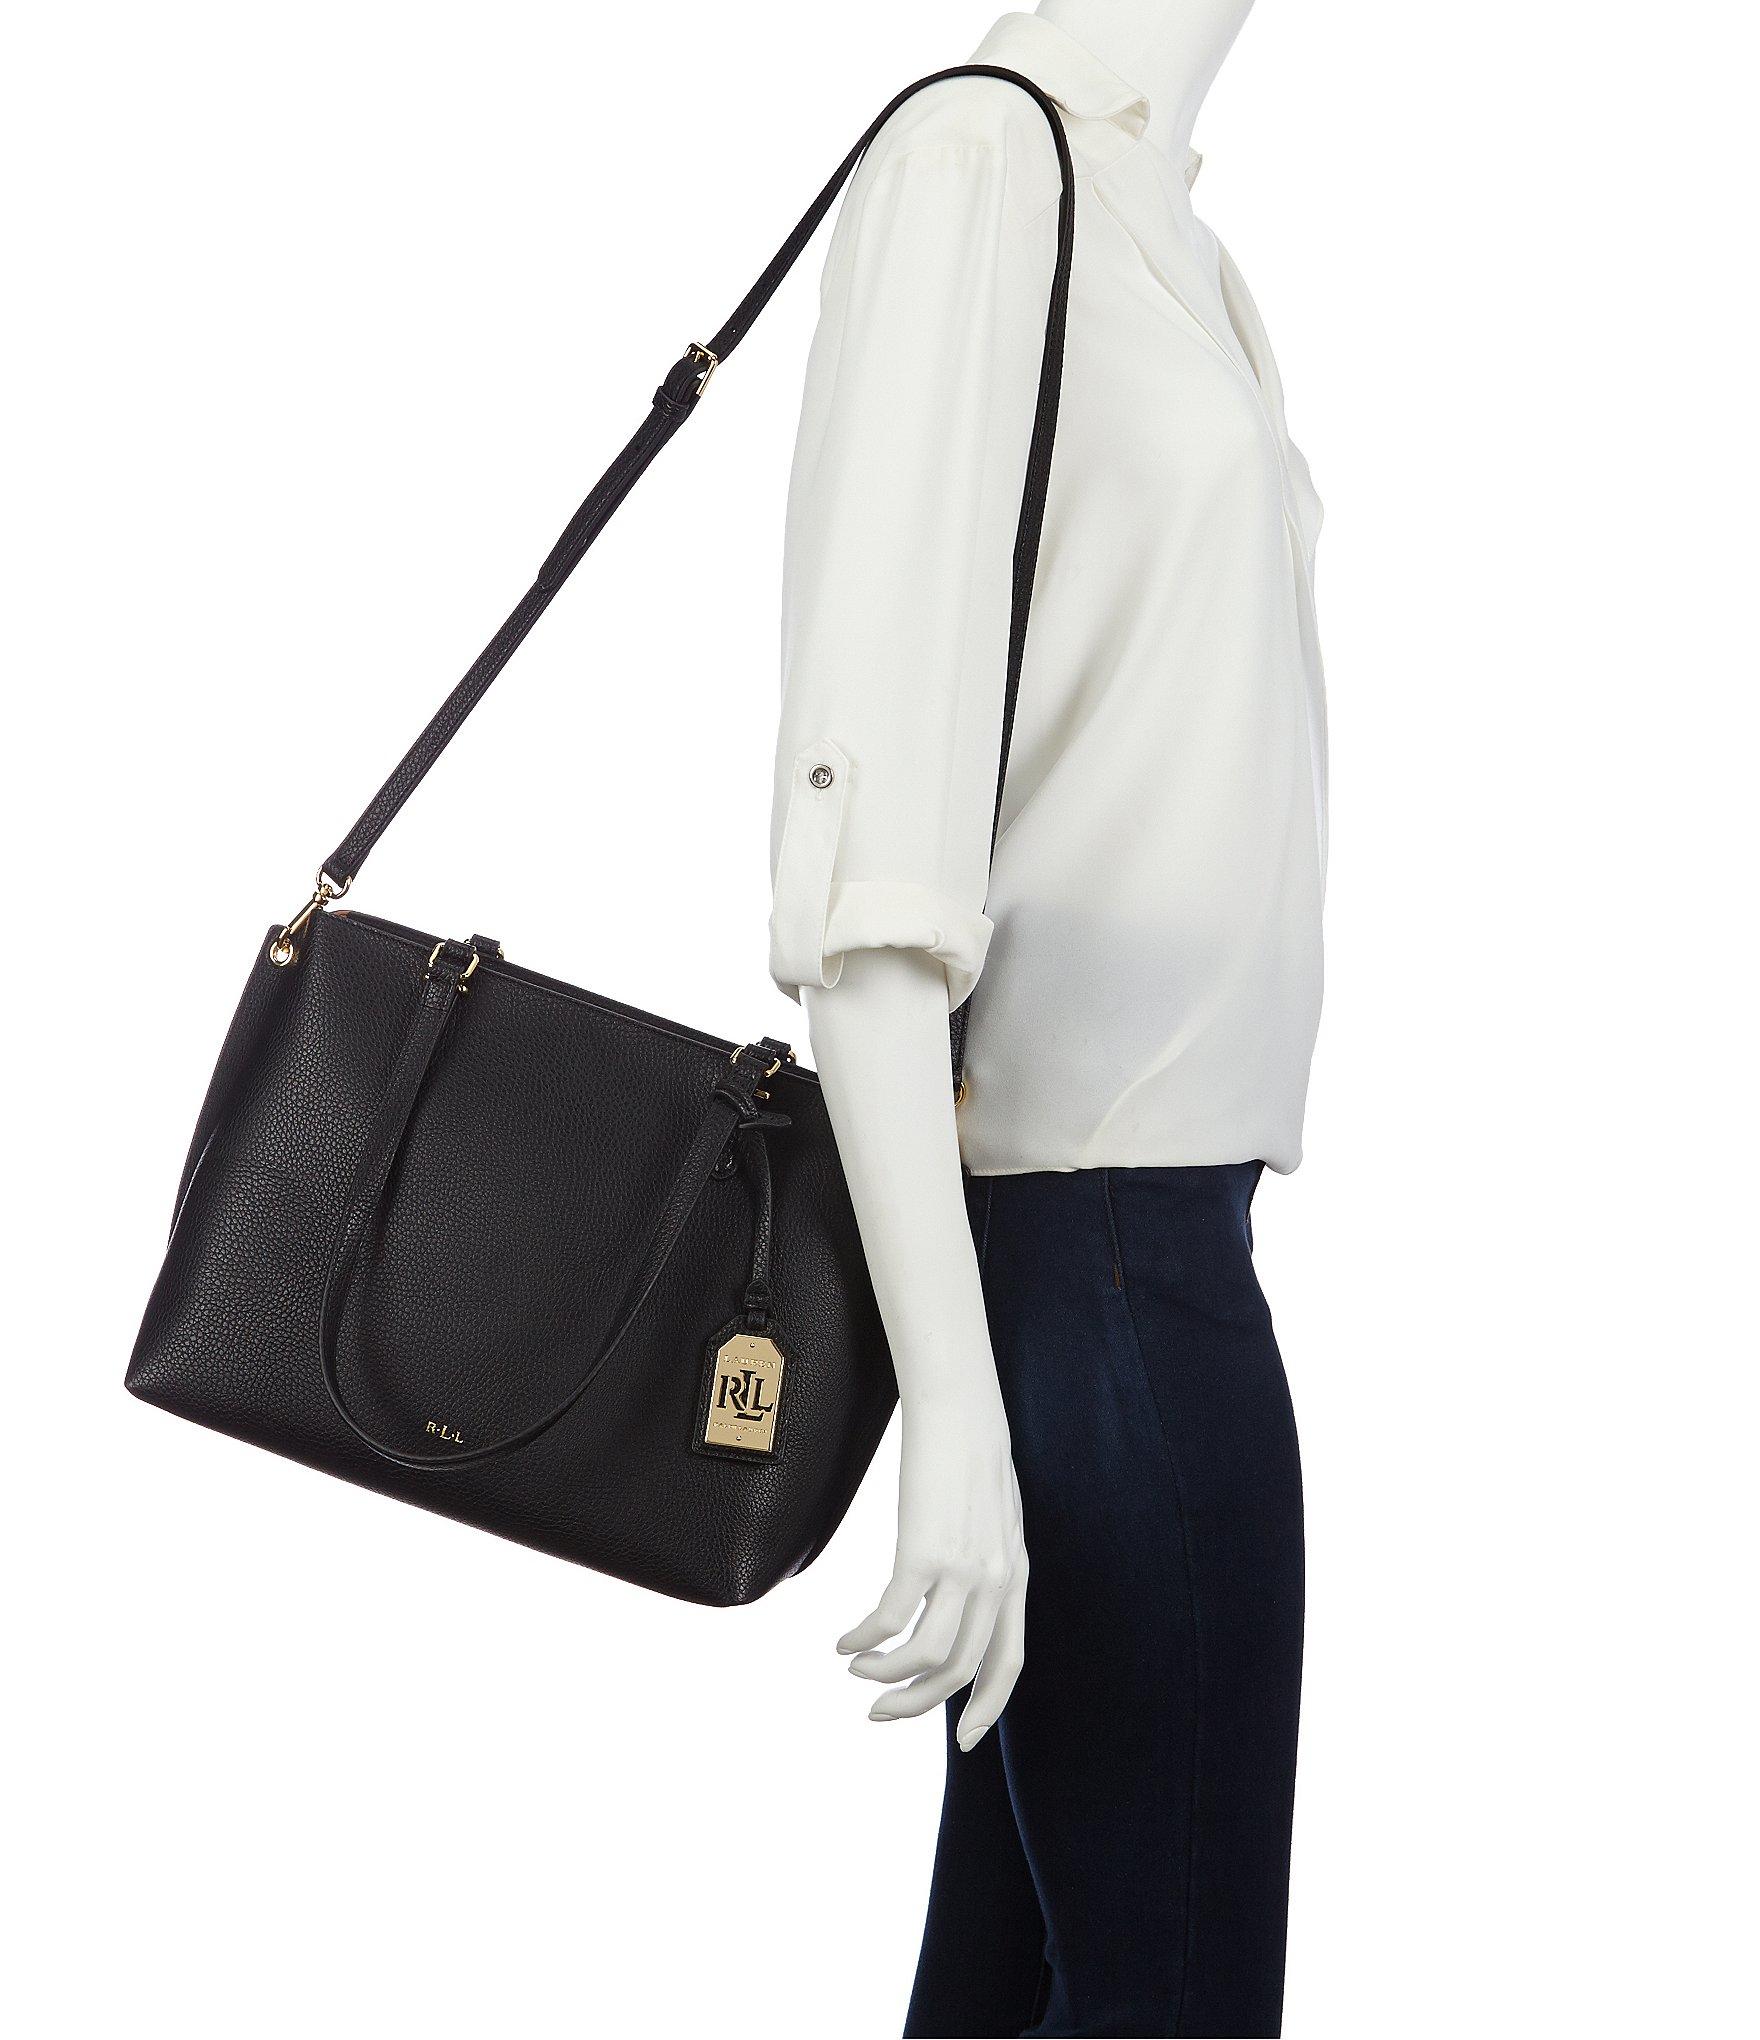 Lyst - Lauren by Ralph Lauren Anfield Medium Abby Shopper Tote in Black fe3a5d4467